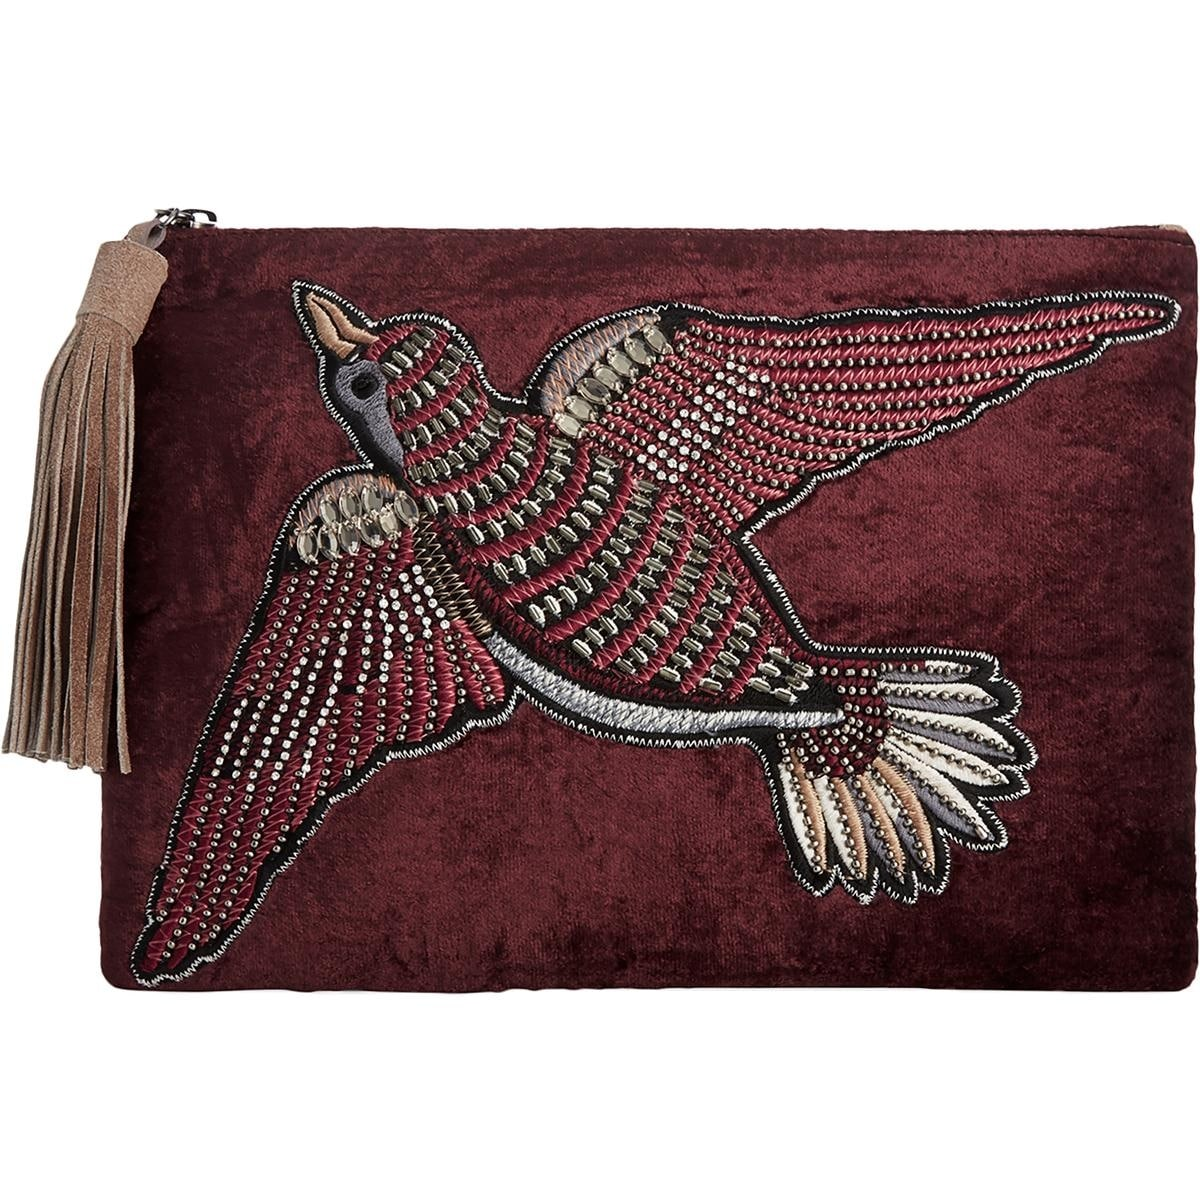 329f94609d7 Shop Sam Edelman Womens Carol Clutch Handbag Embroidered Velvet - Medium -  Free Shipping On Orders Over  45 - Overstock - 18908761